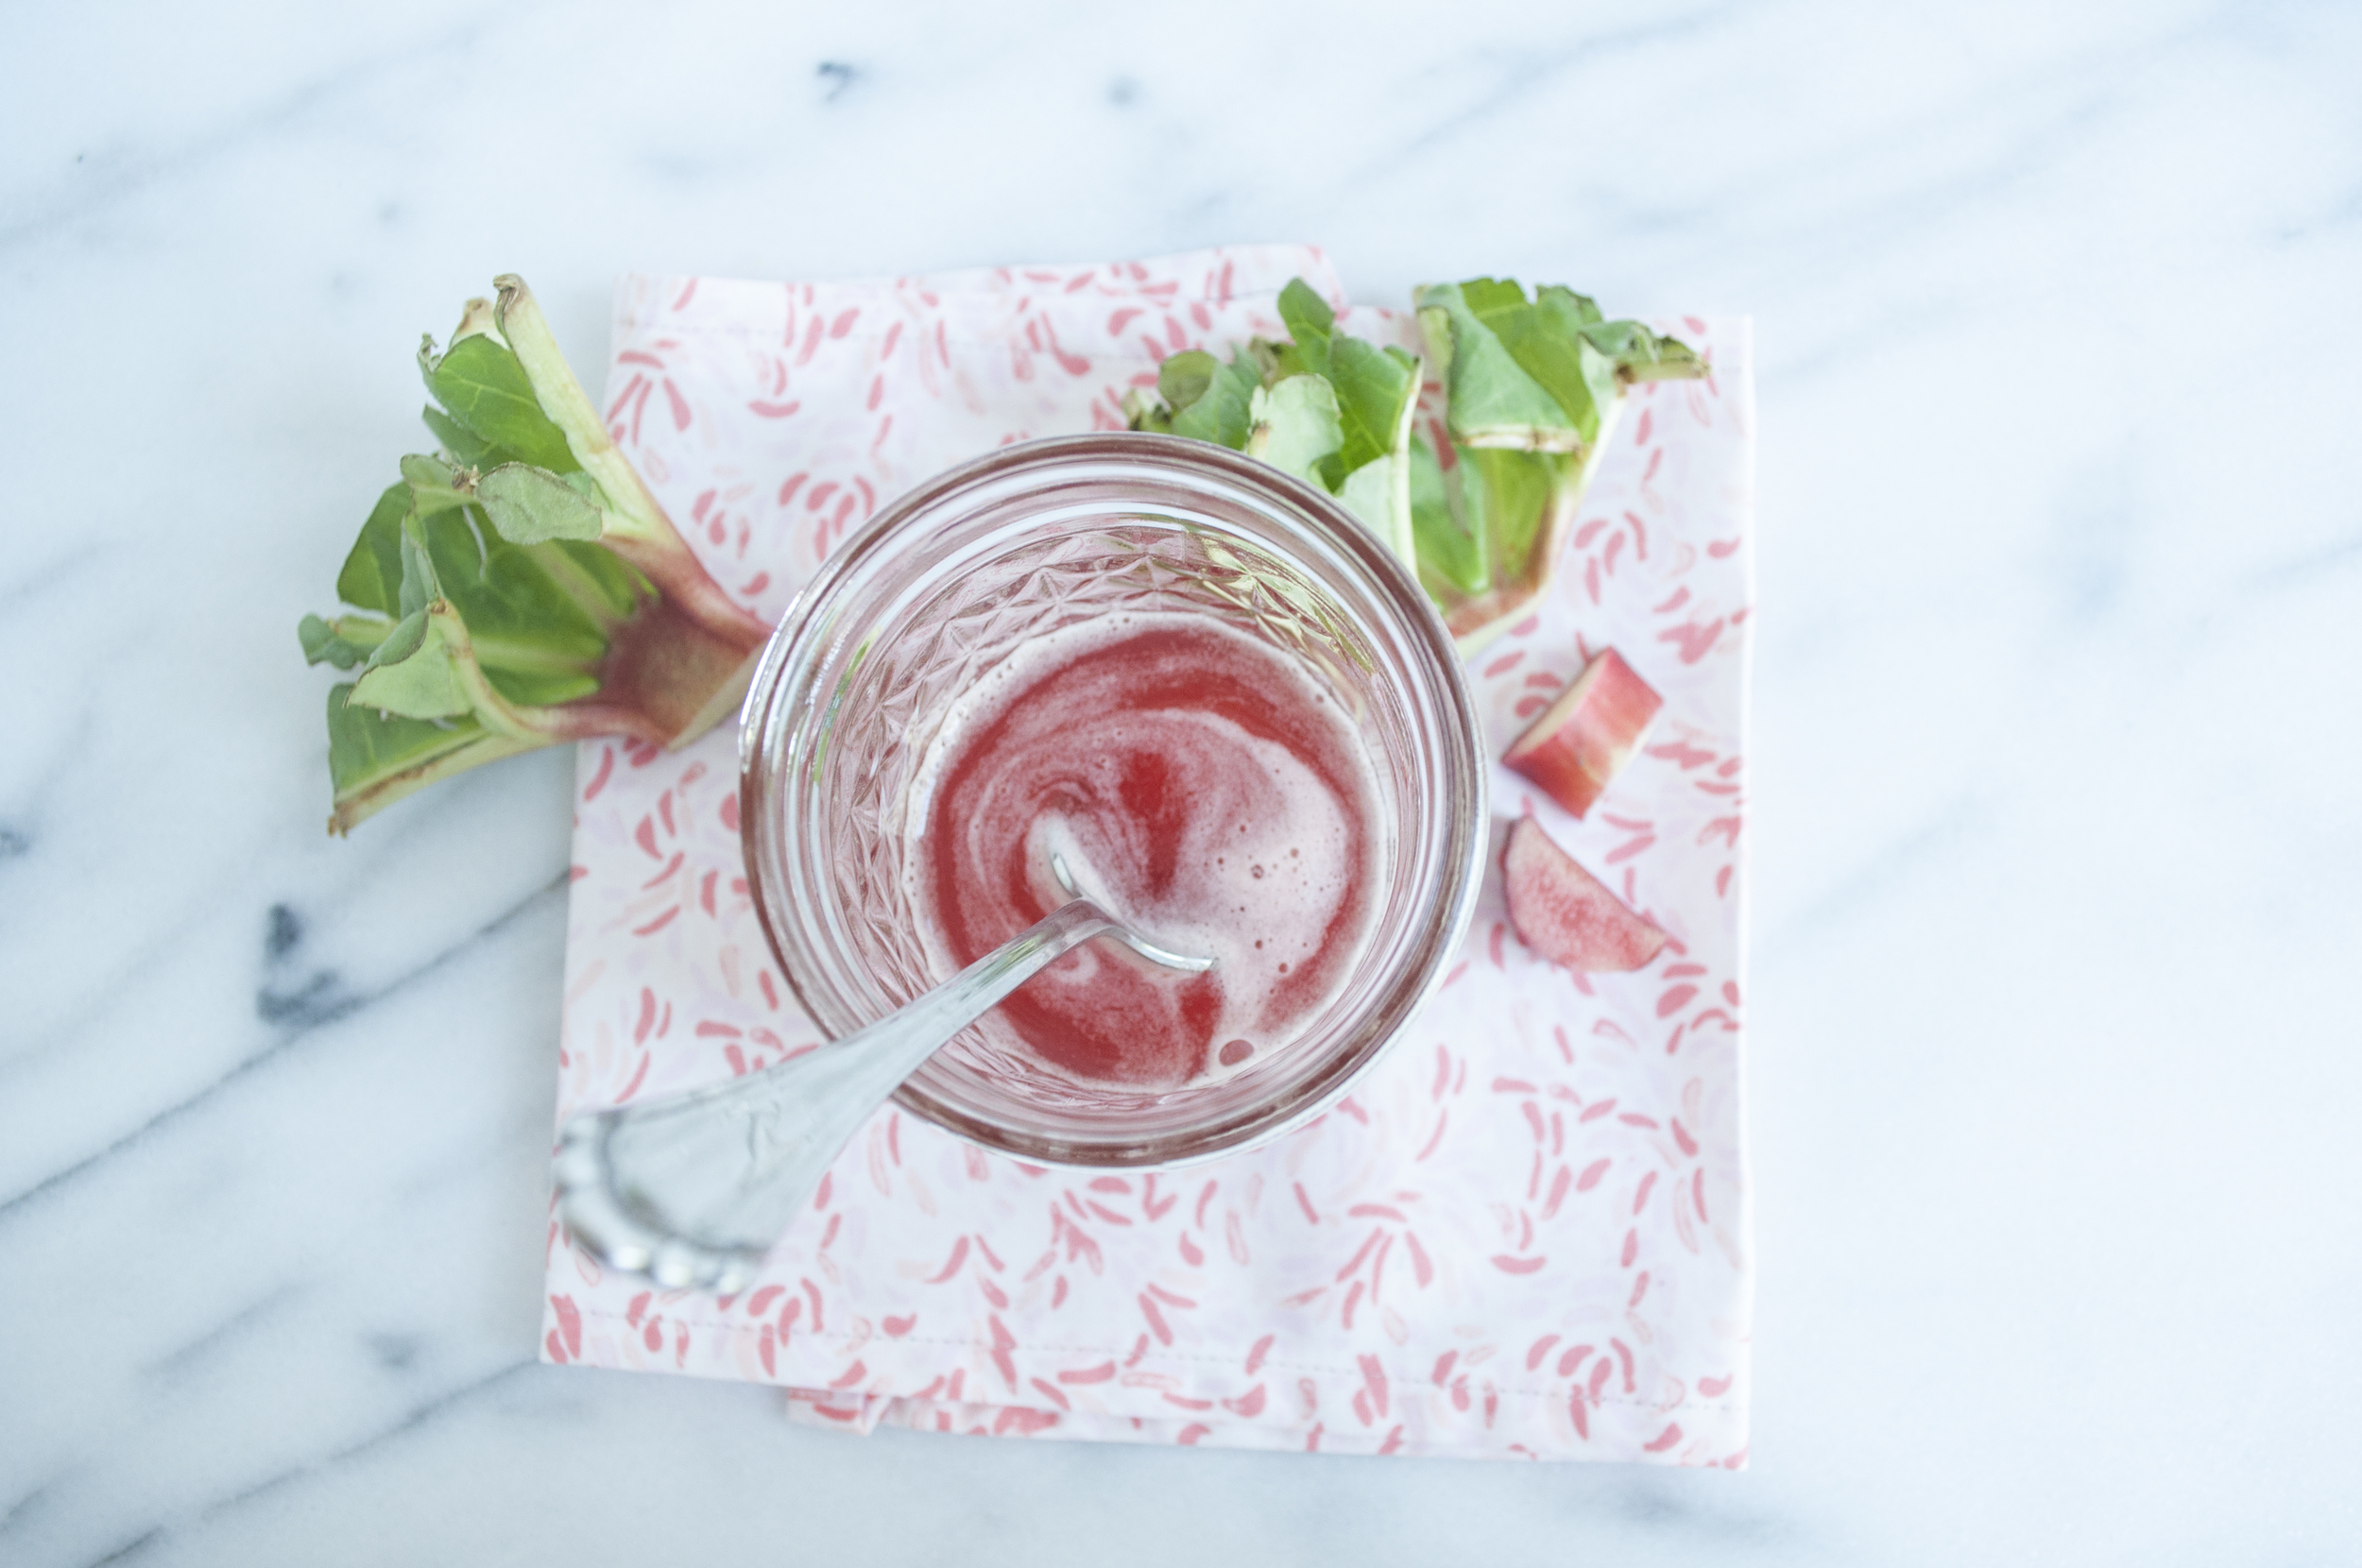 Summerfield Delight | Rhubarb Simple Syrup